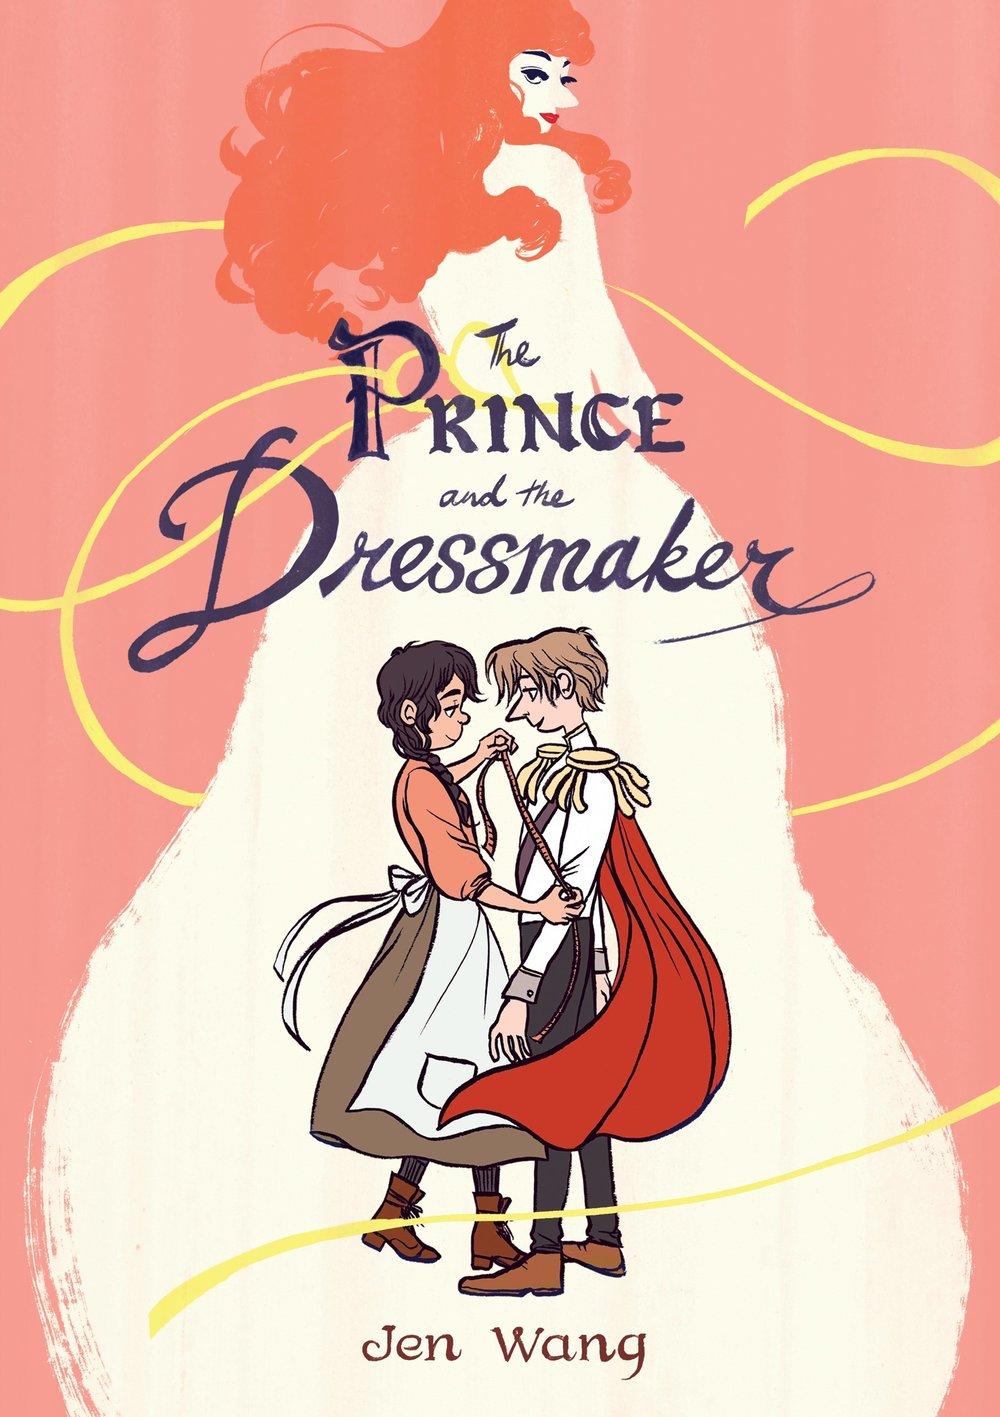 jen-wang-prince-and-dressmaker.jpg